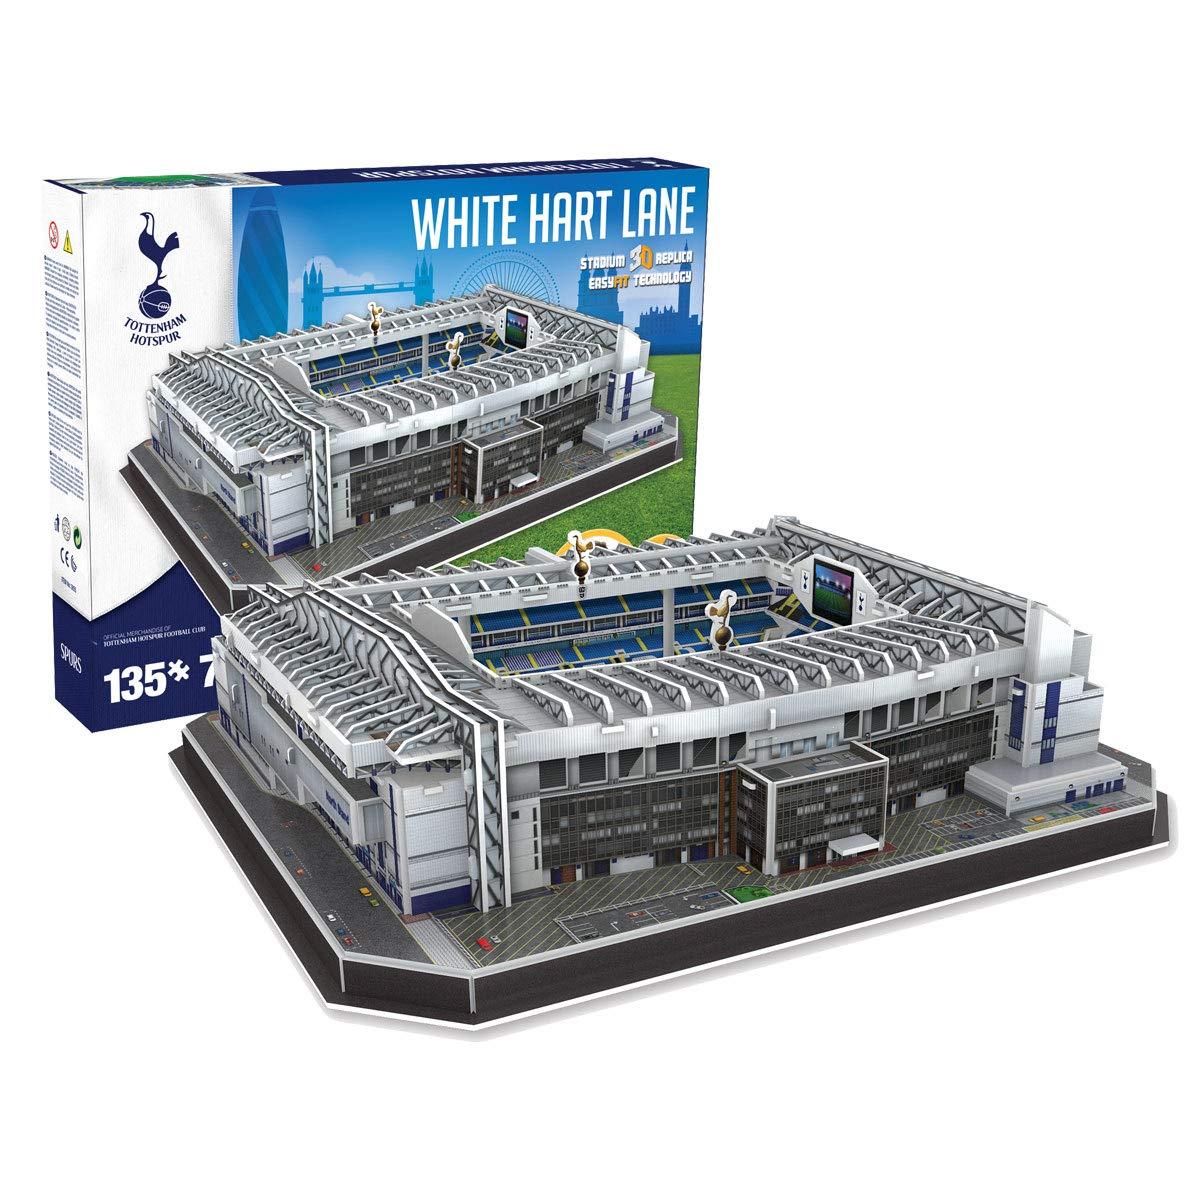 Paul Lamond 3855 Tottenham Stadium 3D Puzzle Nanostad